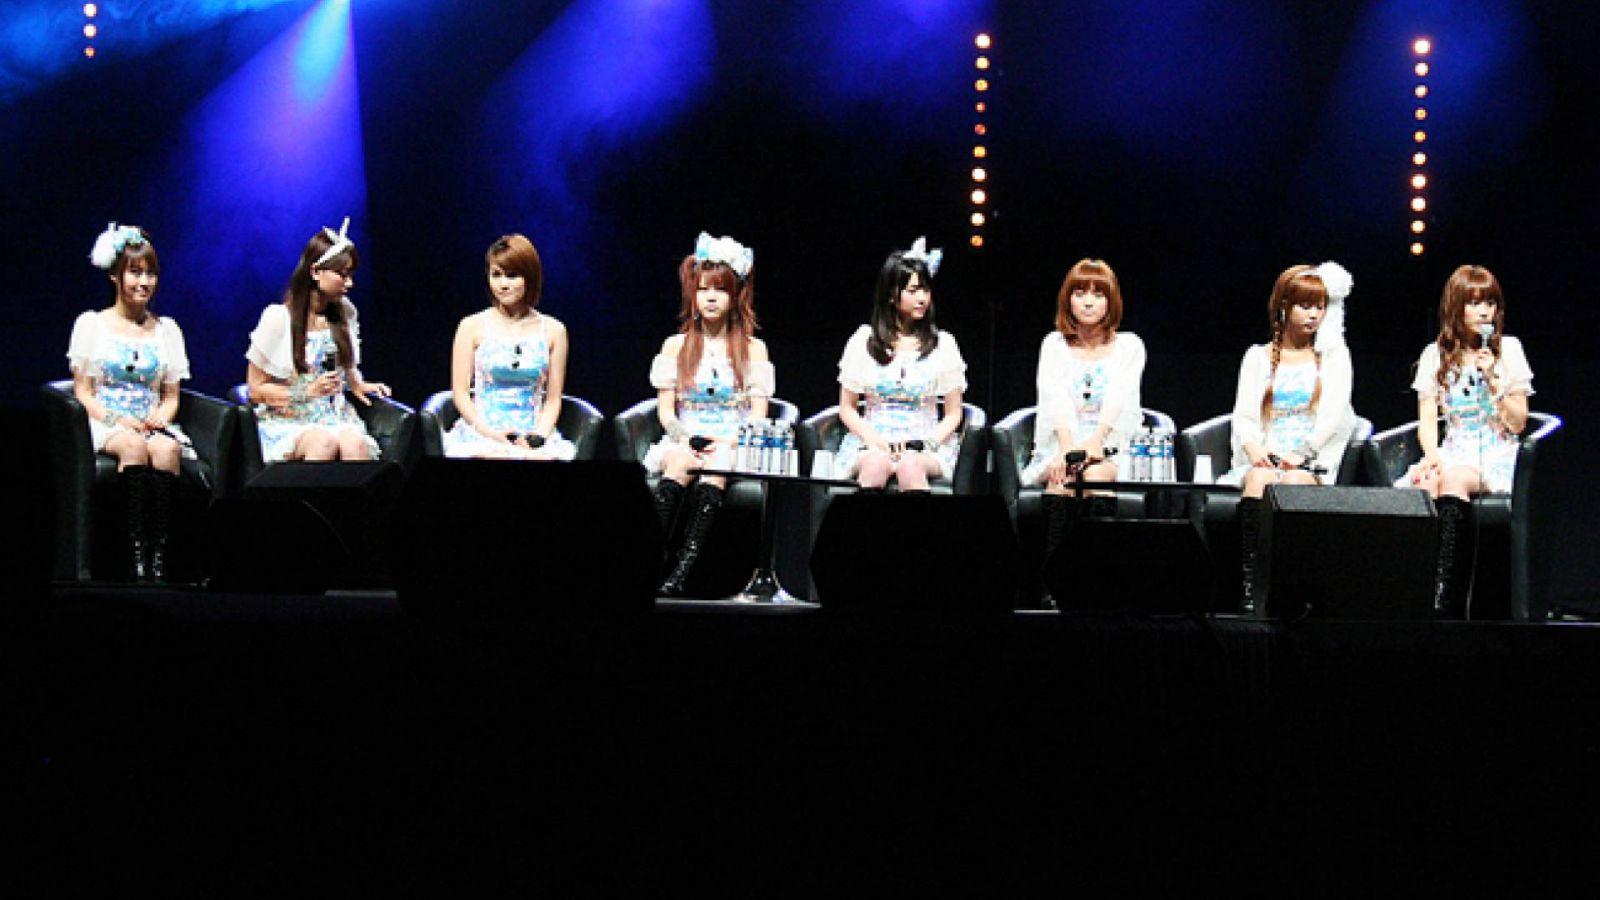 Публичная конференция Morning Musume◦ на Japan Expo © Morning Musume. - JaME - Jeremy Corral